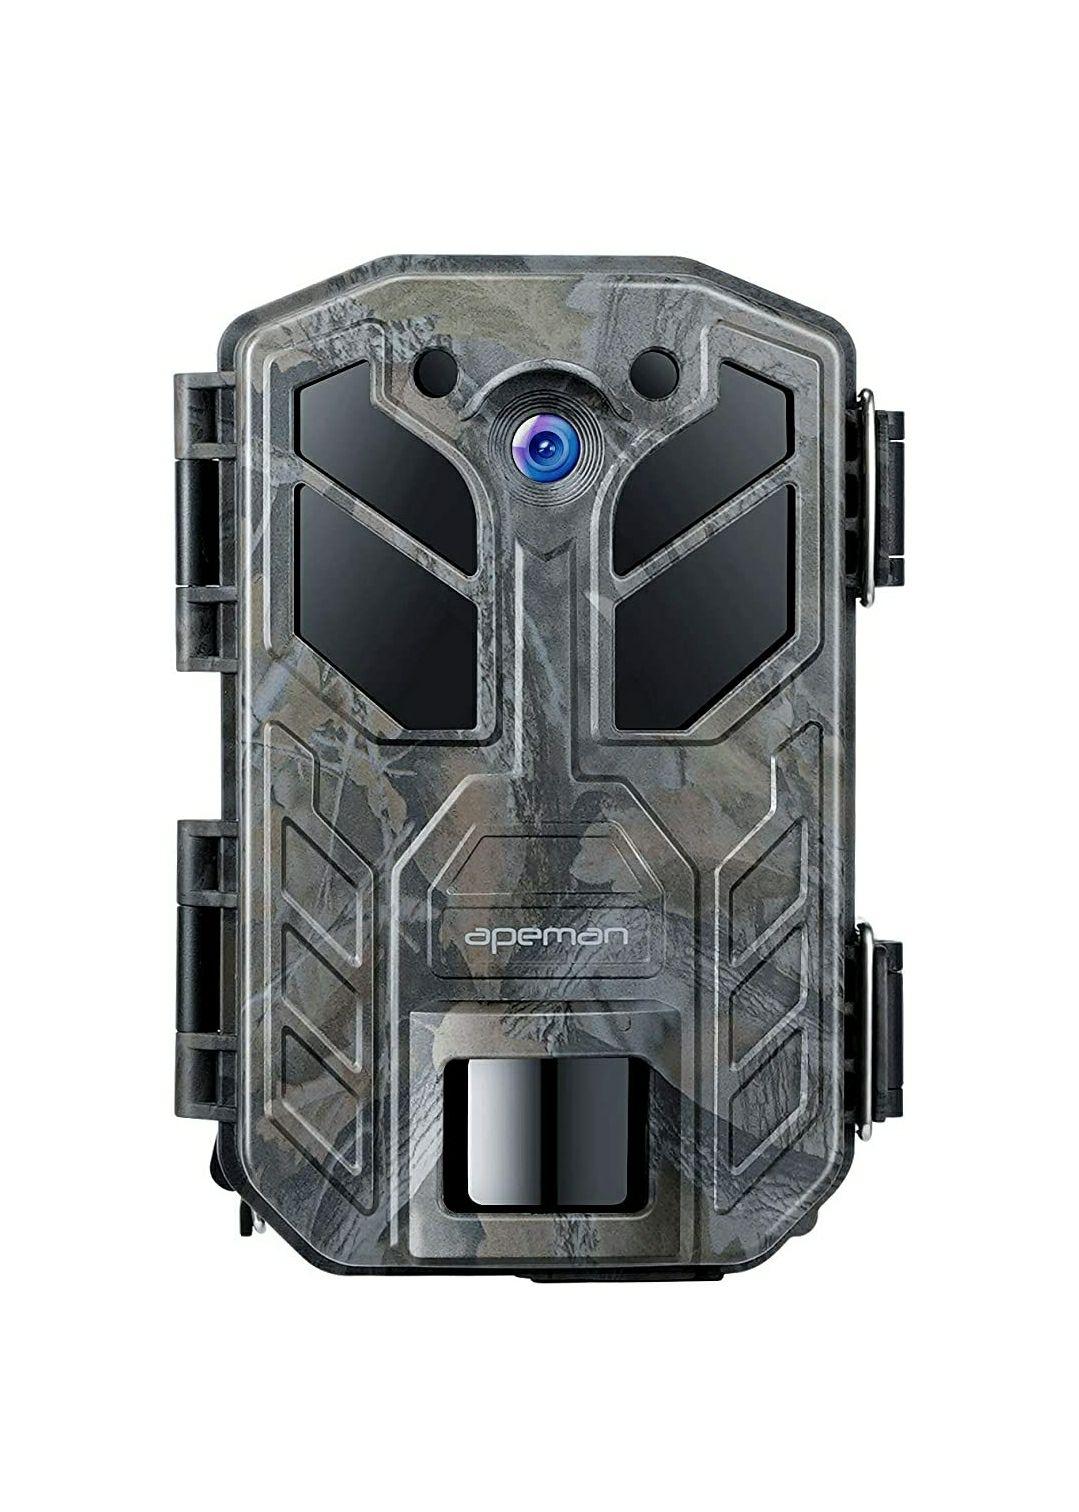 Caméra de chasse Apeman - 4k 30MP (Vendeur Tiers)